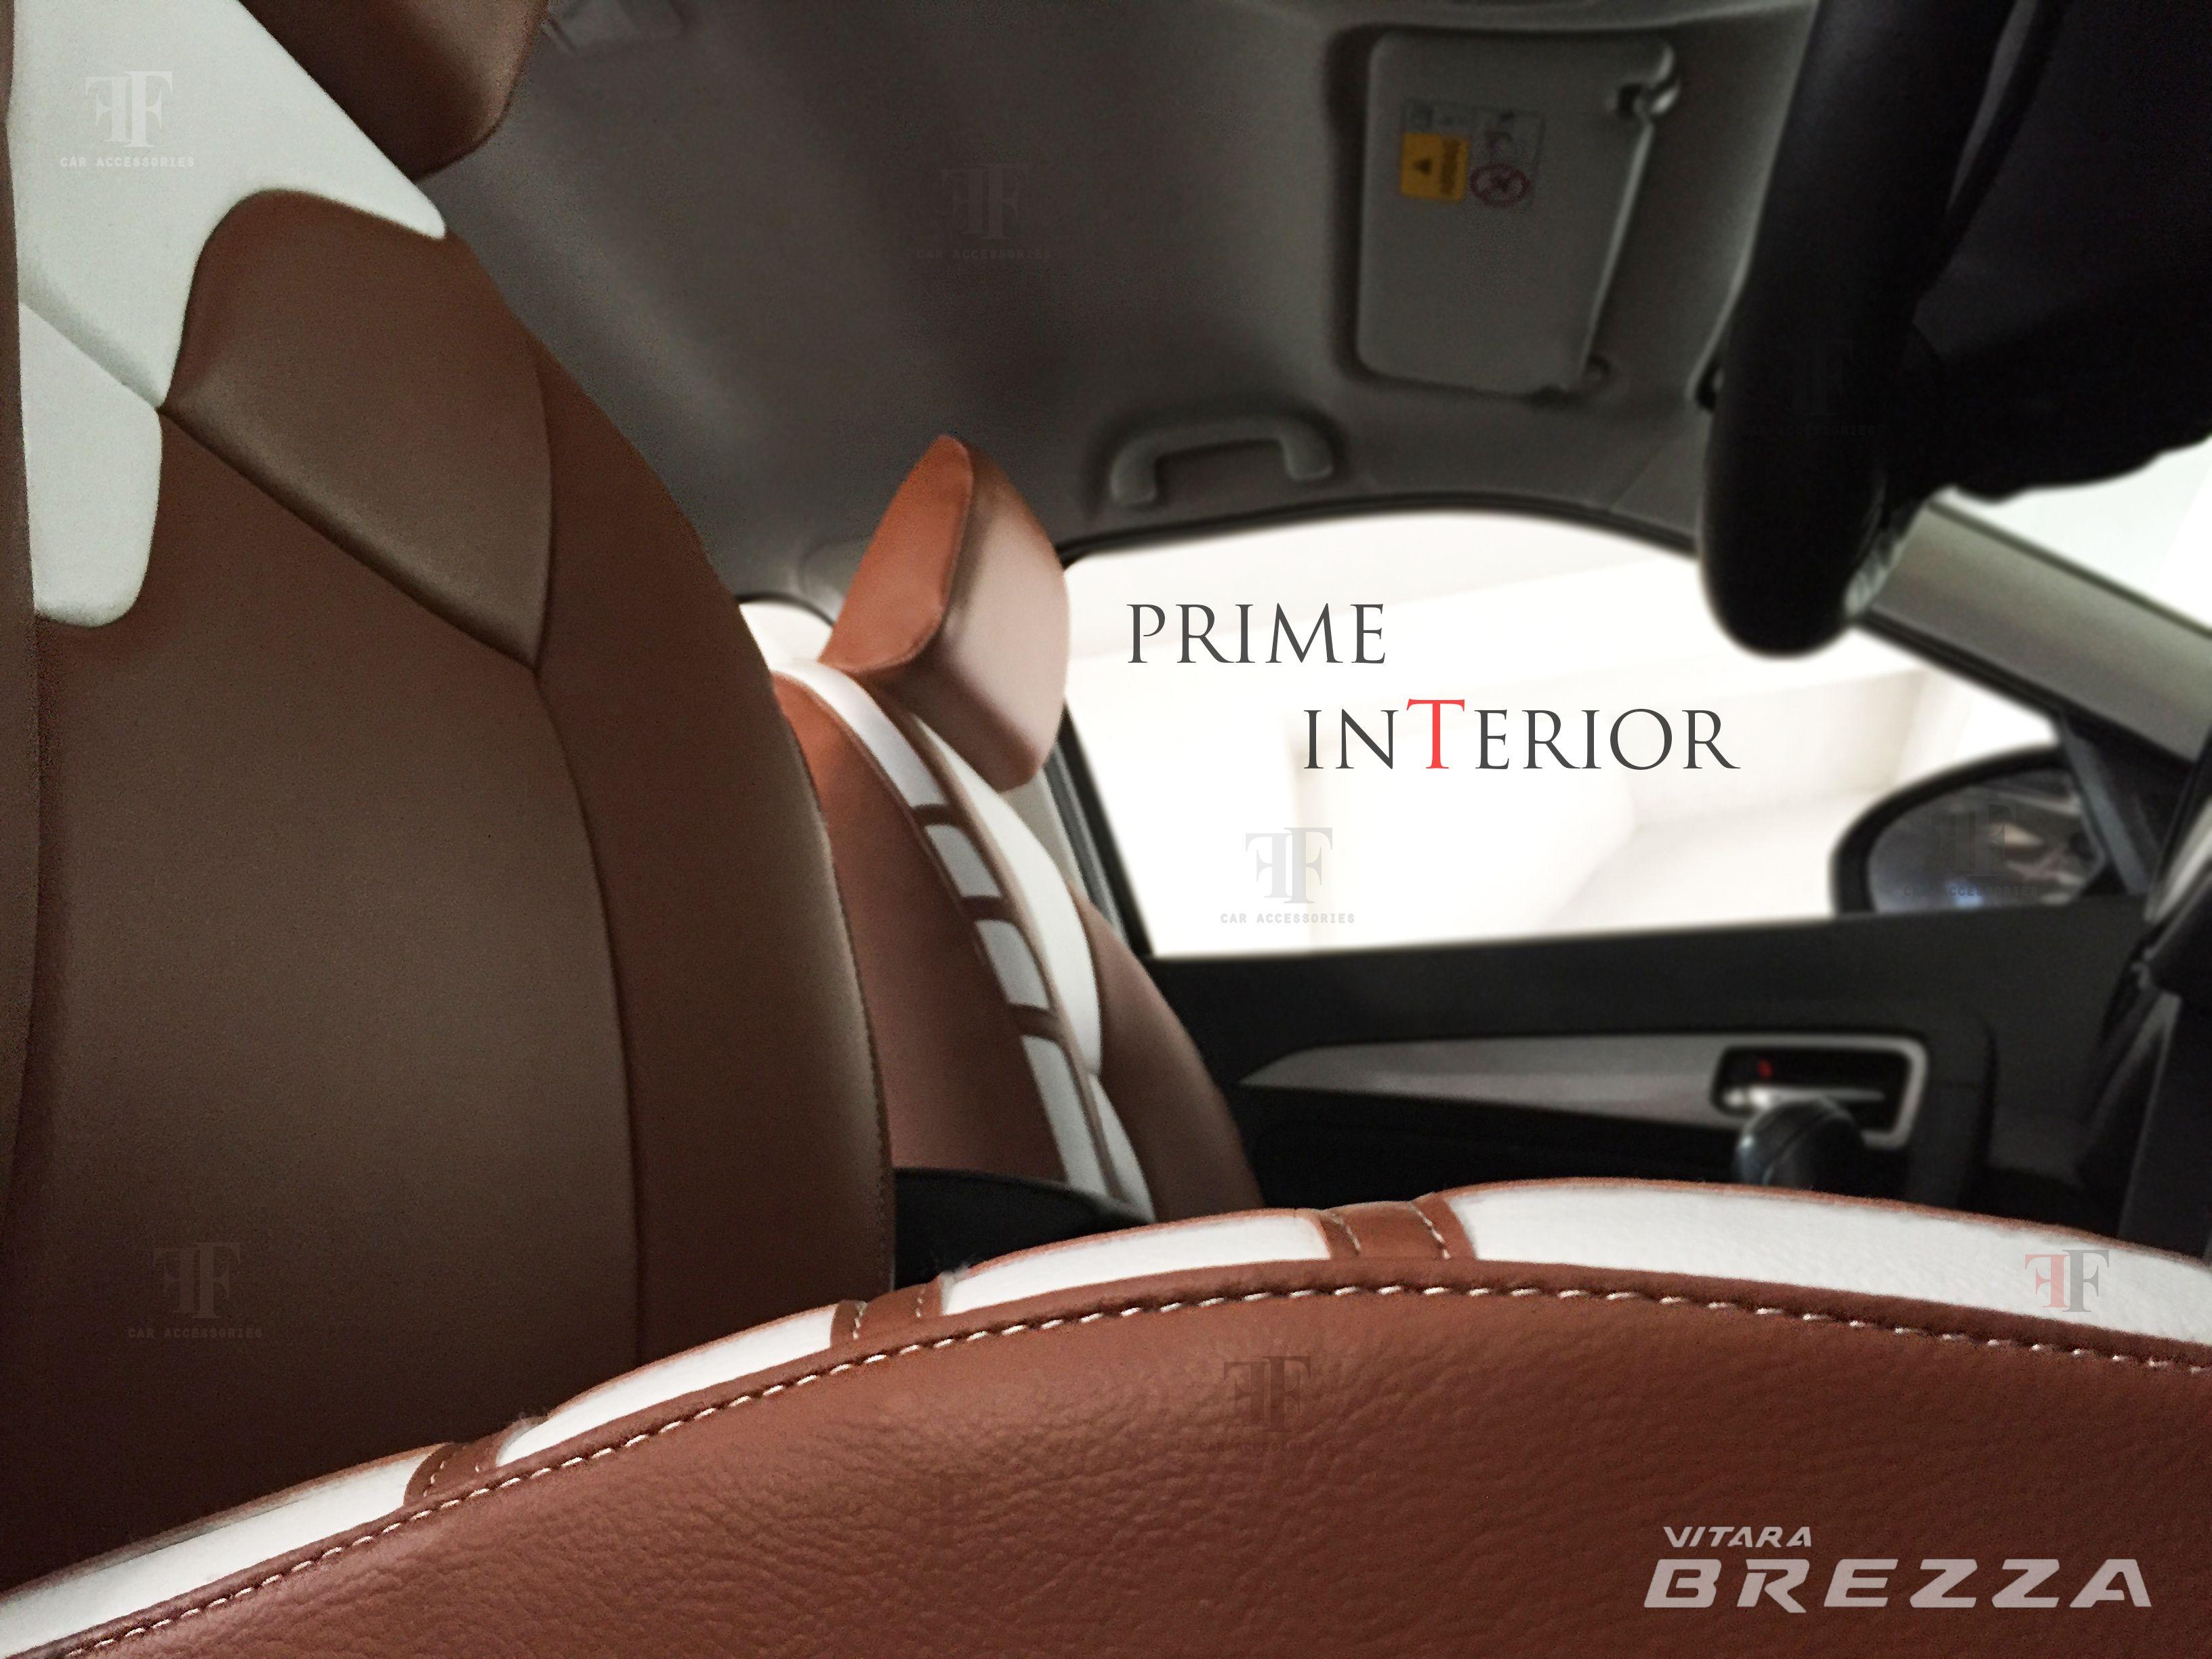 Prime interior for vitara brezza customised by team ff car accessories chennai best car accessories